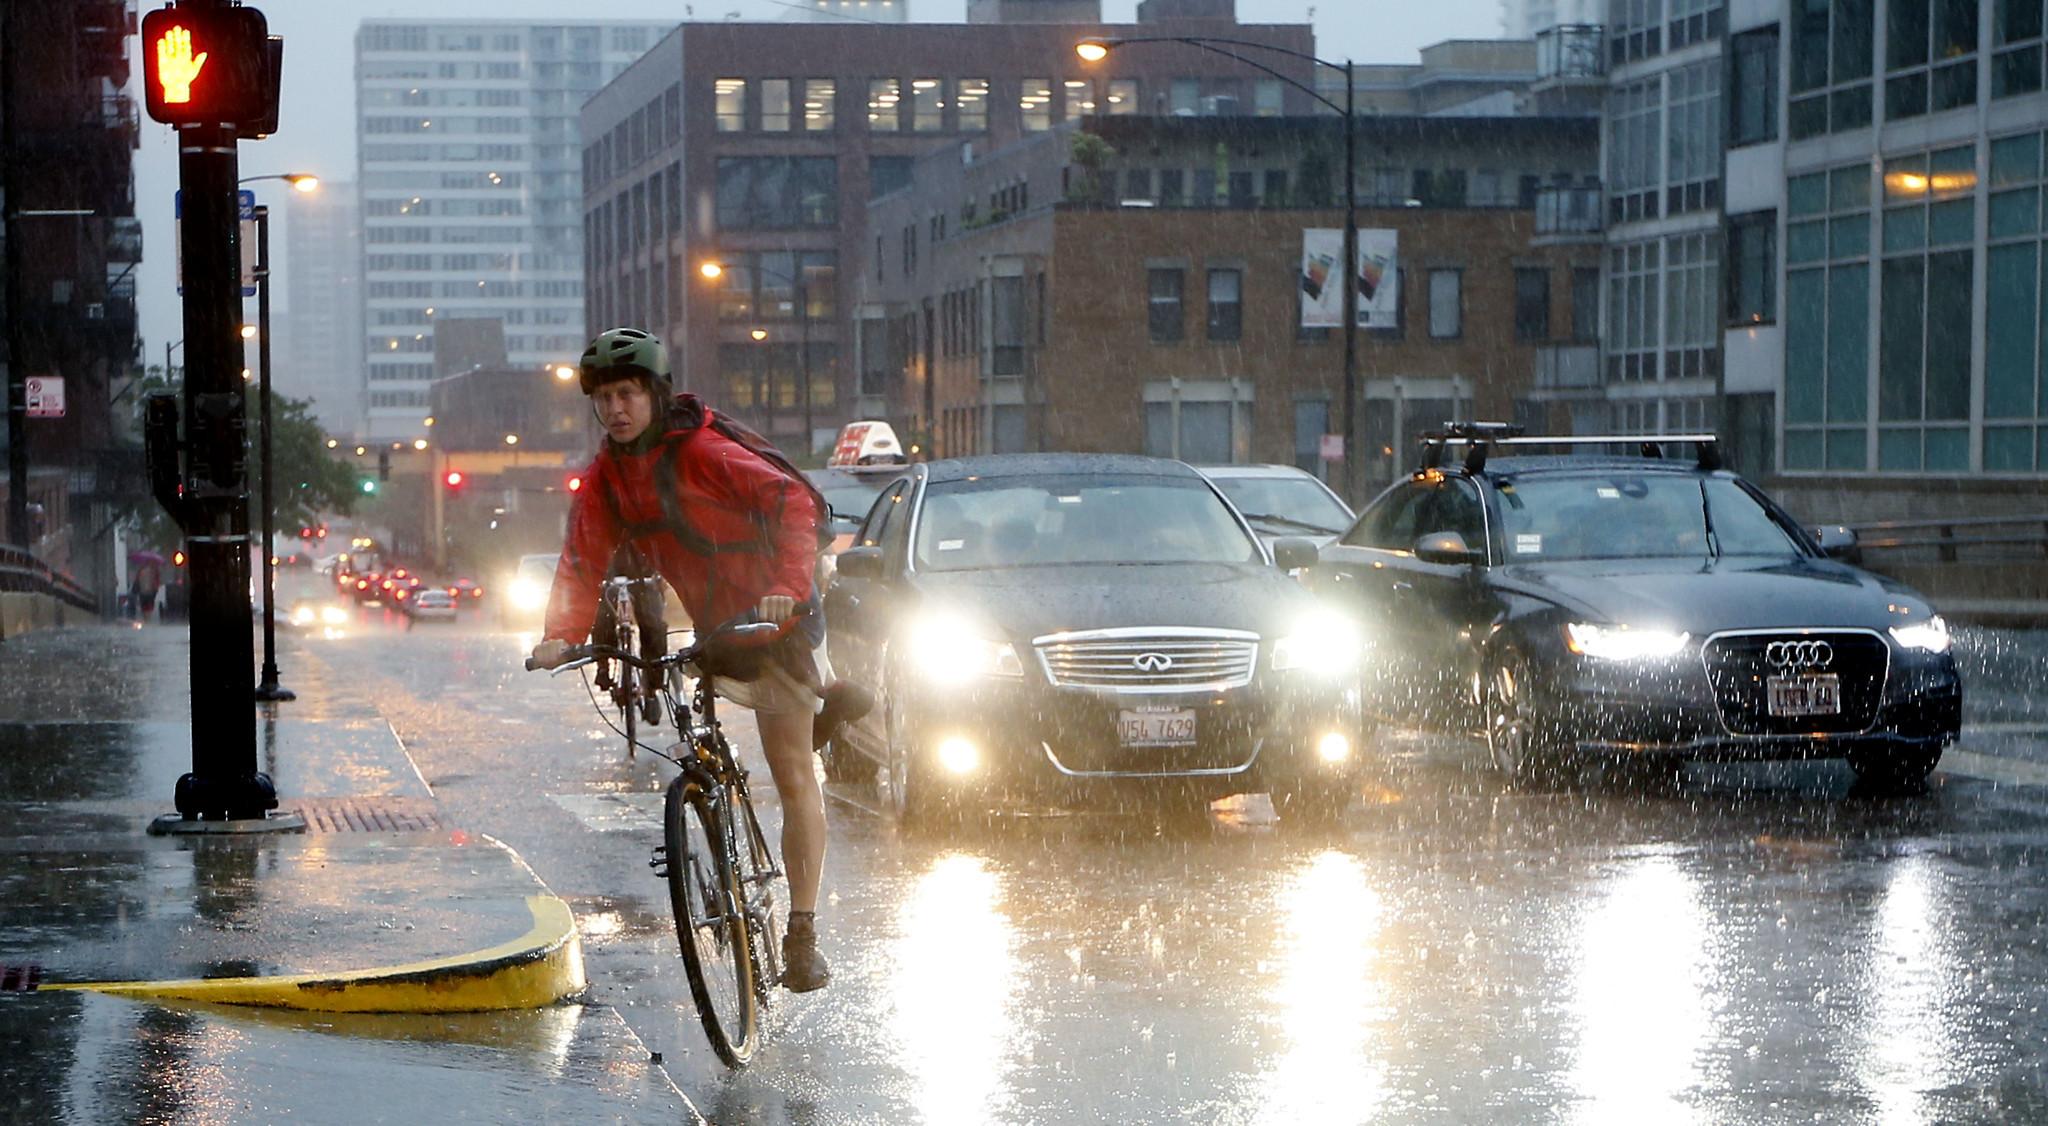 chicago weather - photo #39